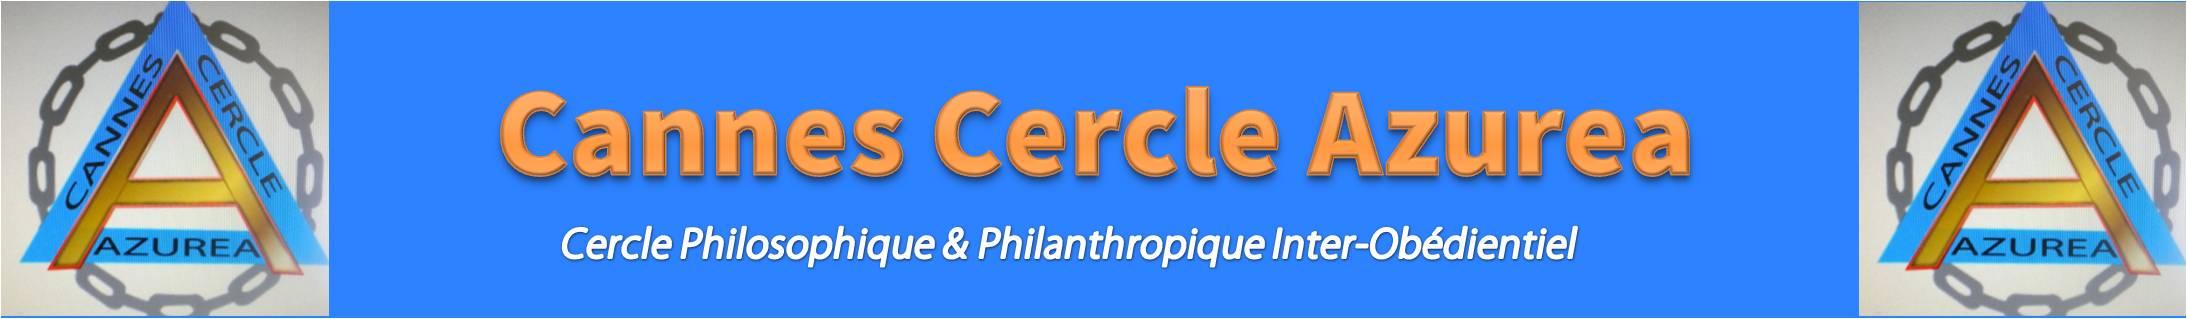 Cannes Cercle Azurea